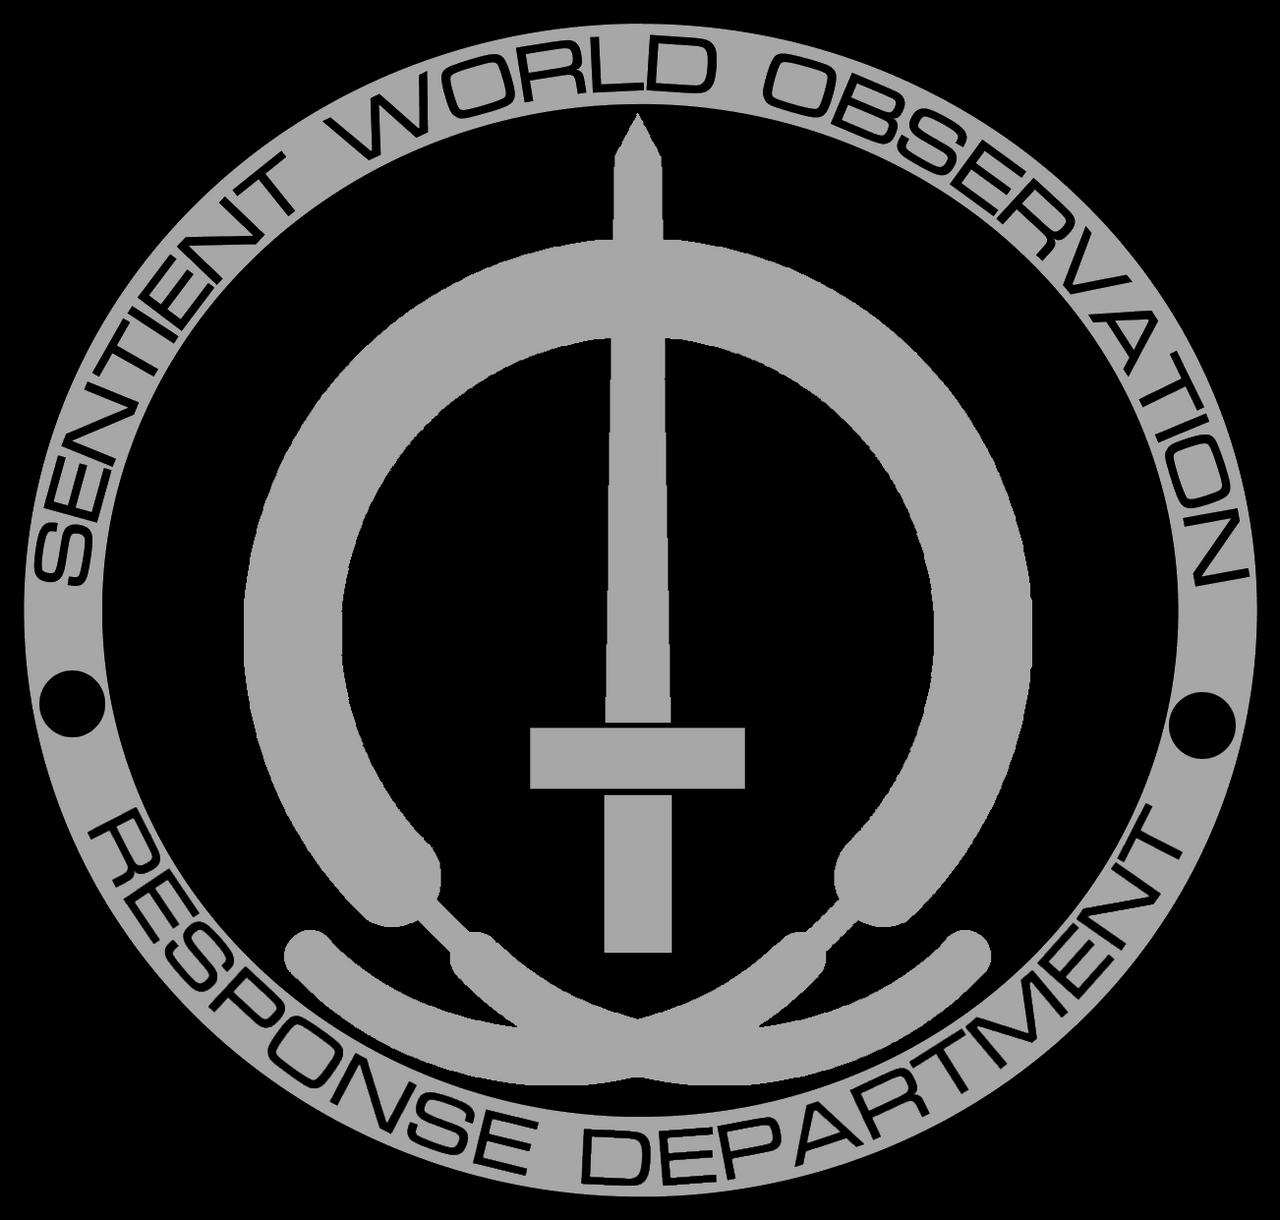 Ssr Logo Design